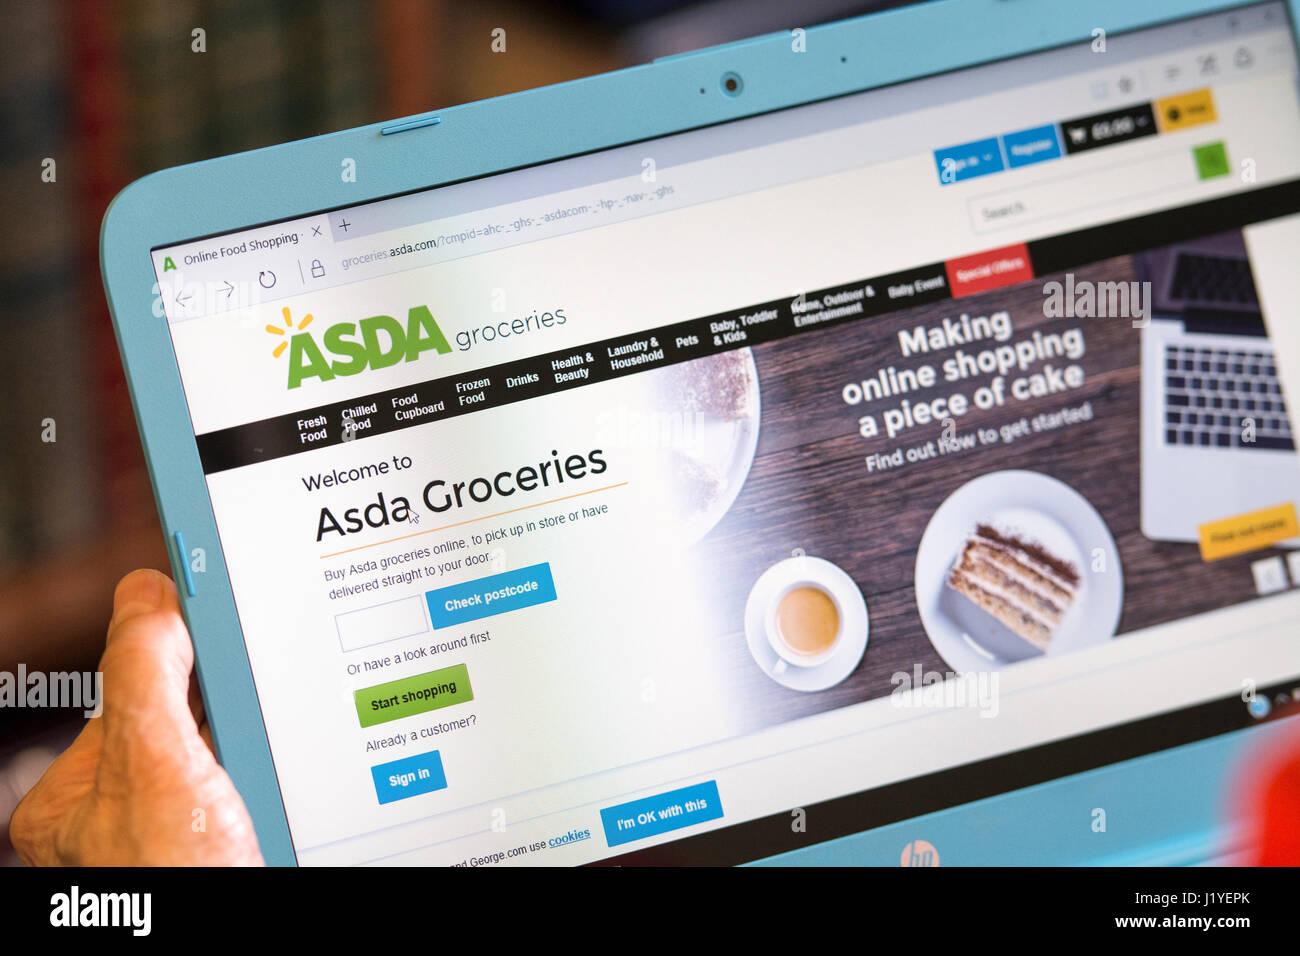 ASDA Groceries website, Screen on Tablet Laptop - Stock Image